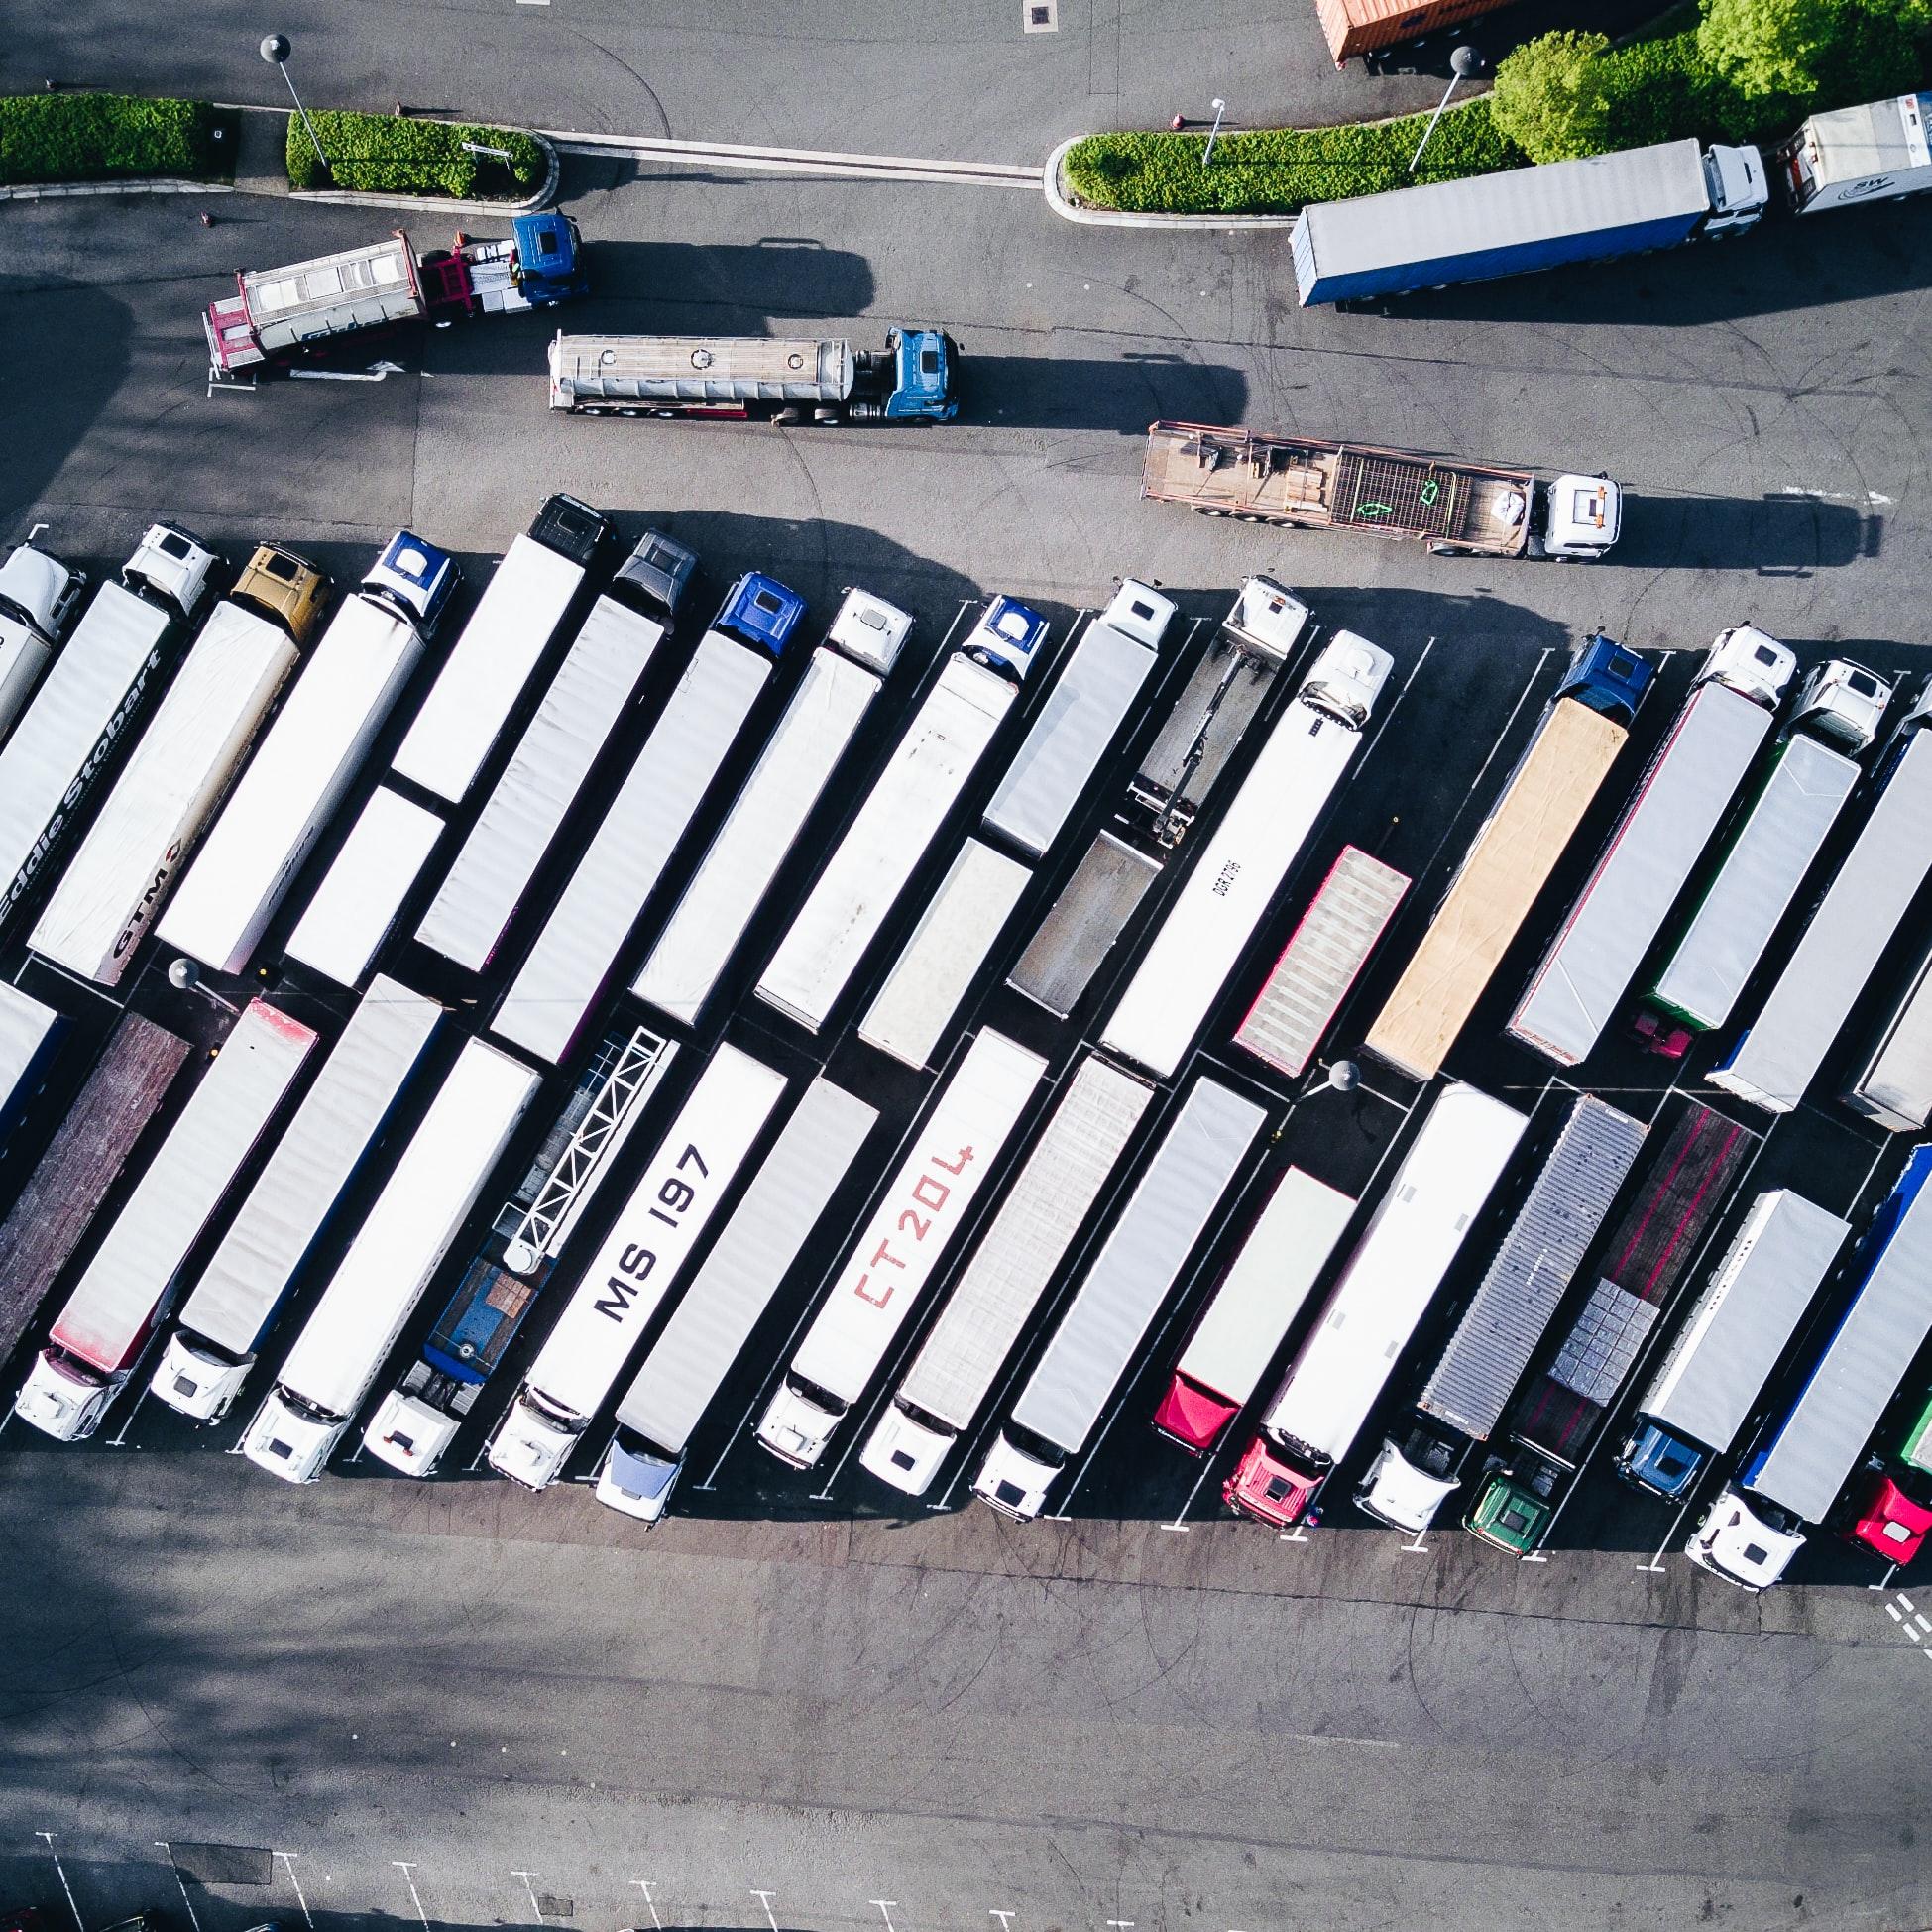 Logistics market analysis